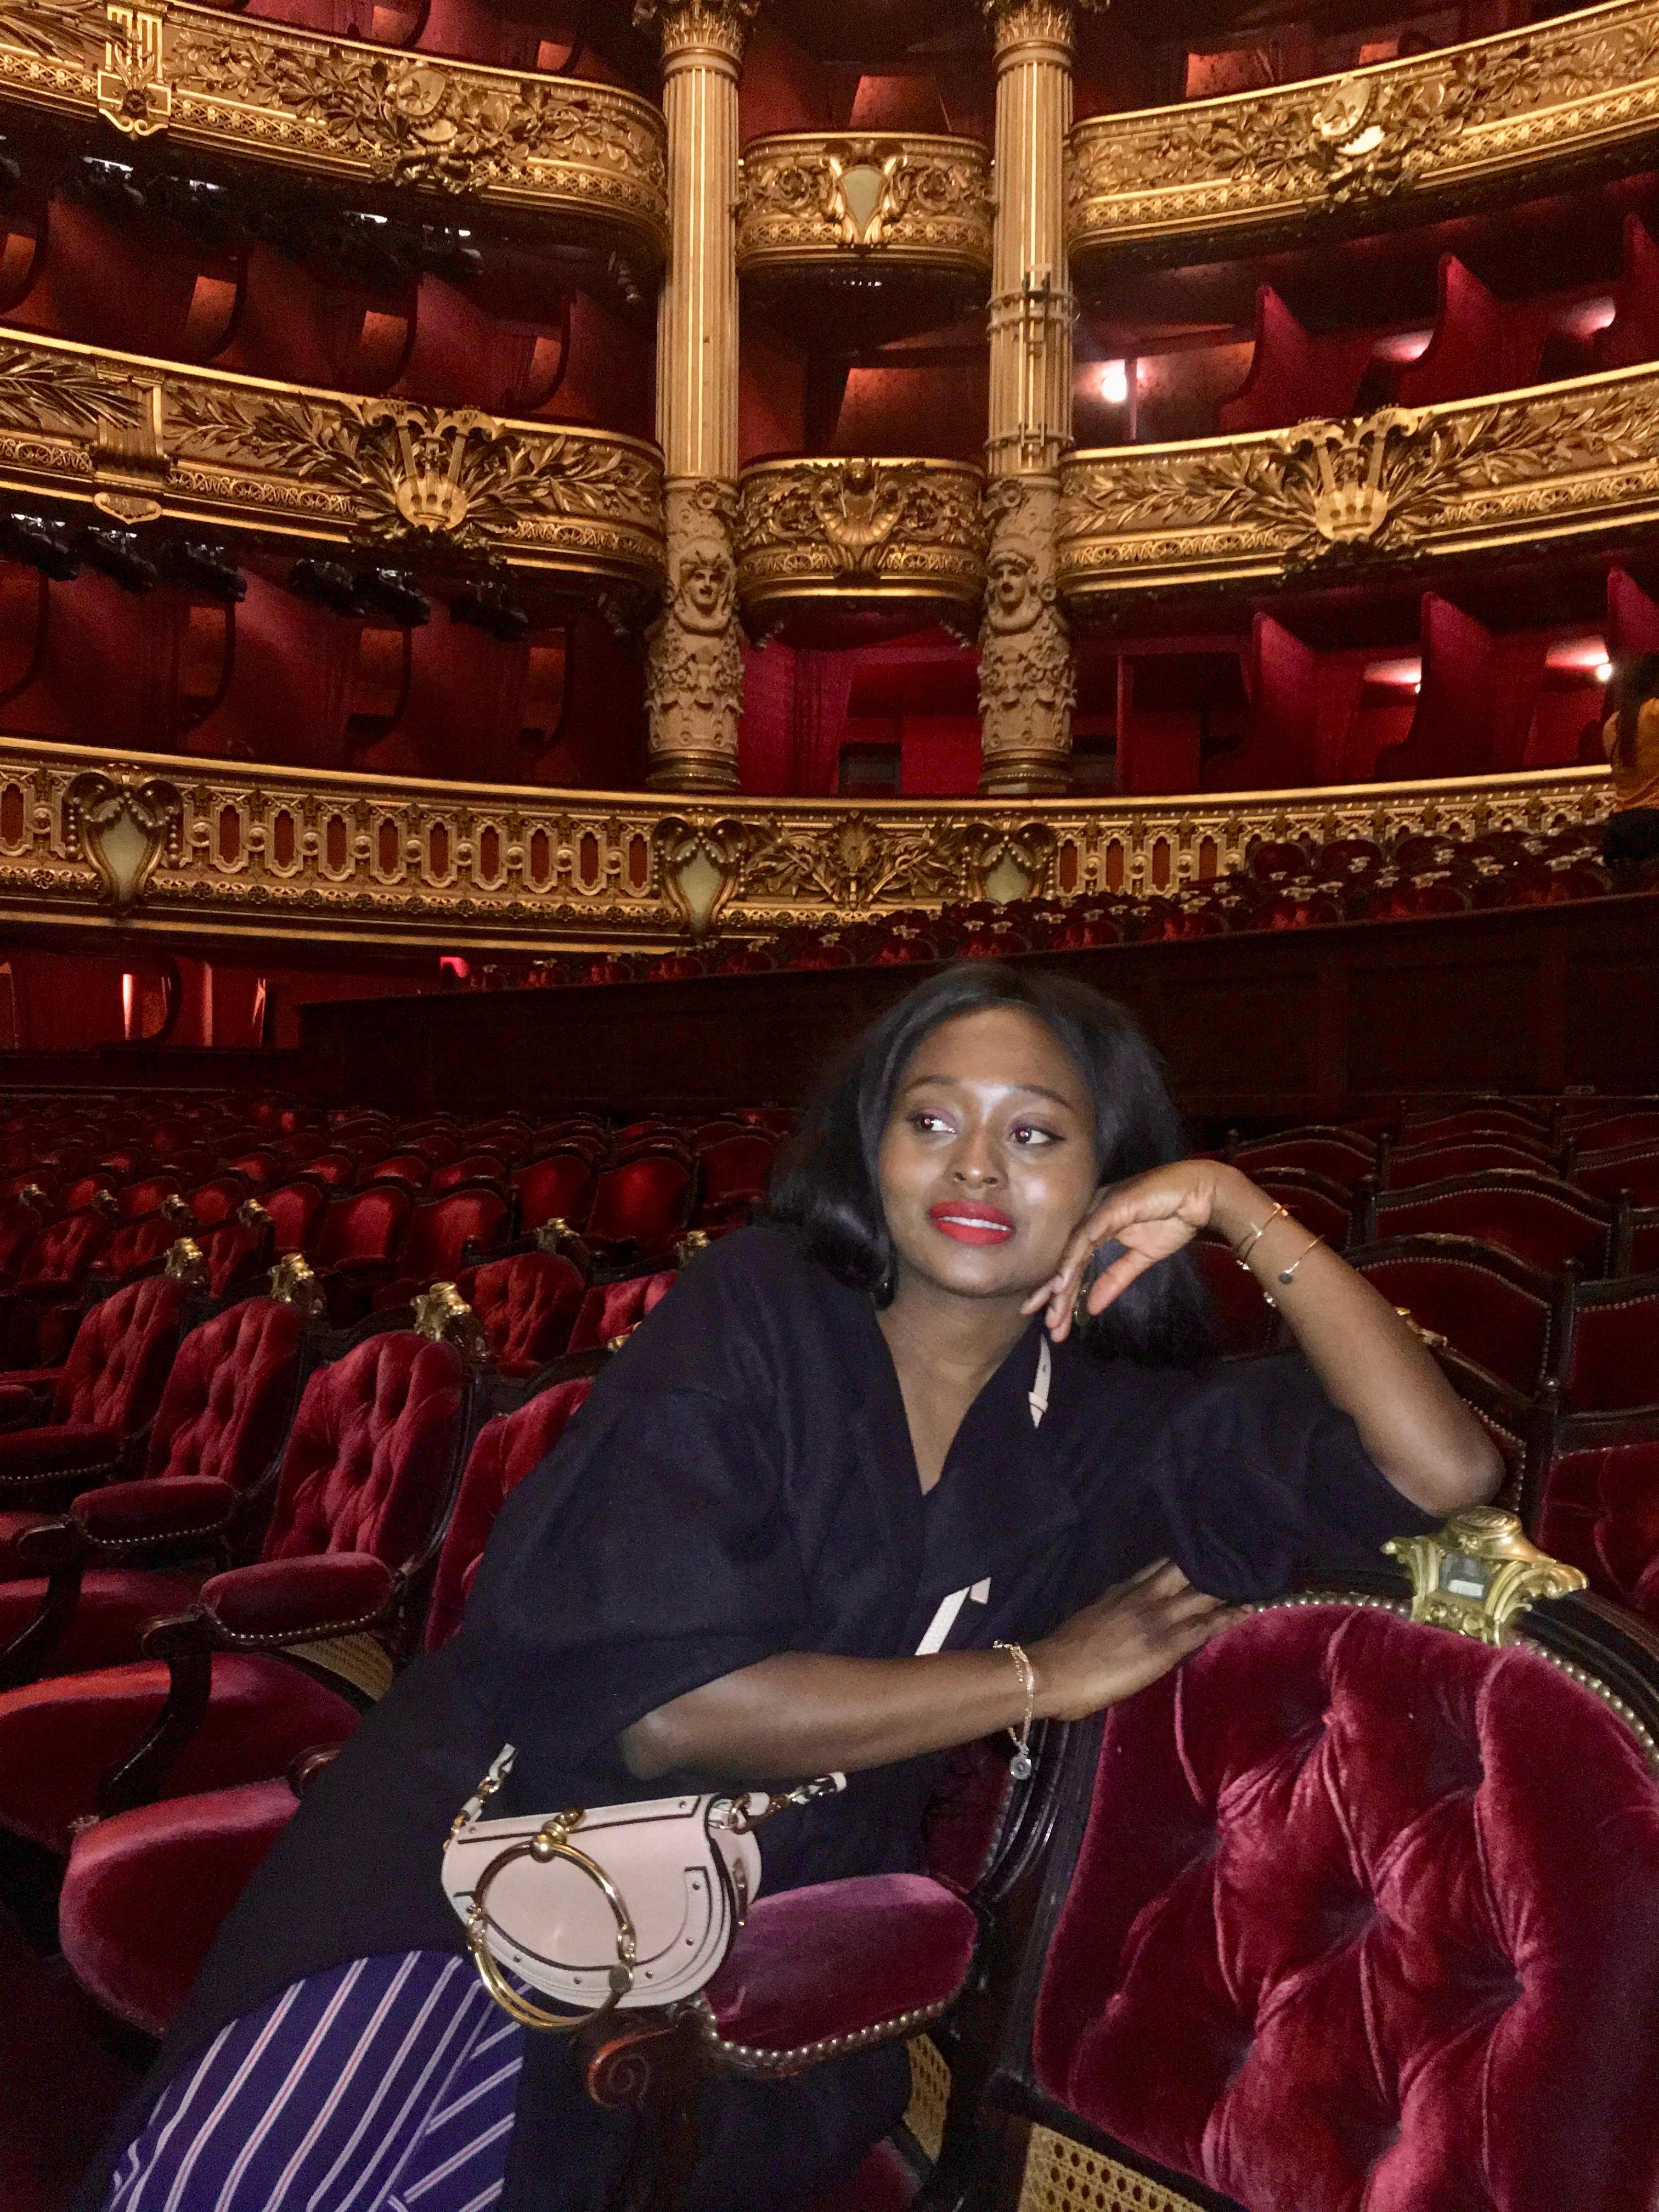 atelier cologne Opera Garnier